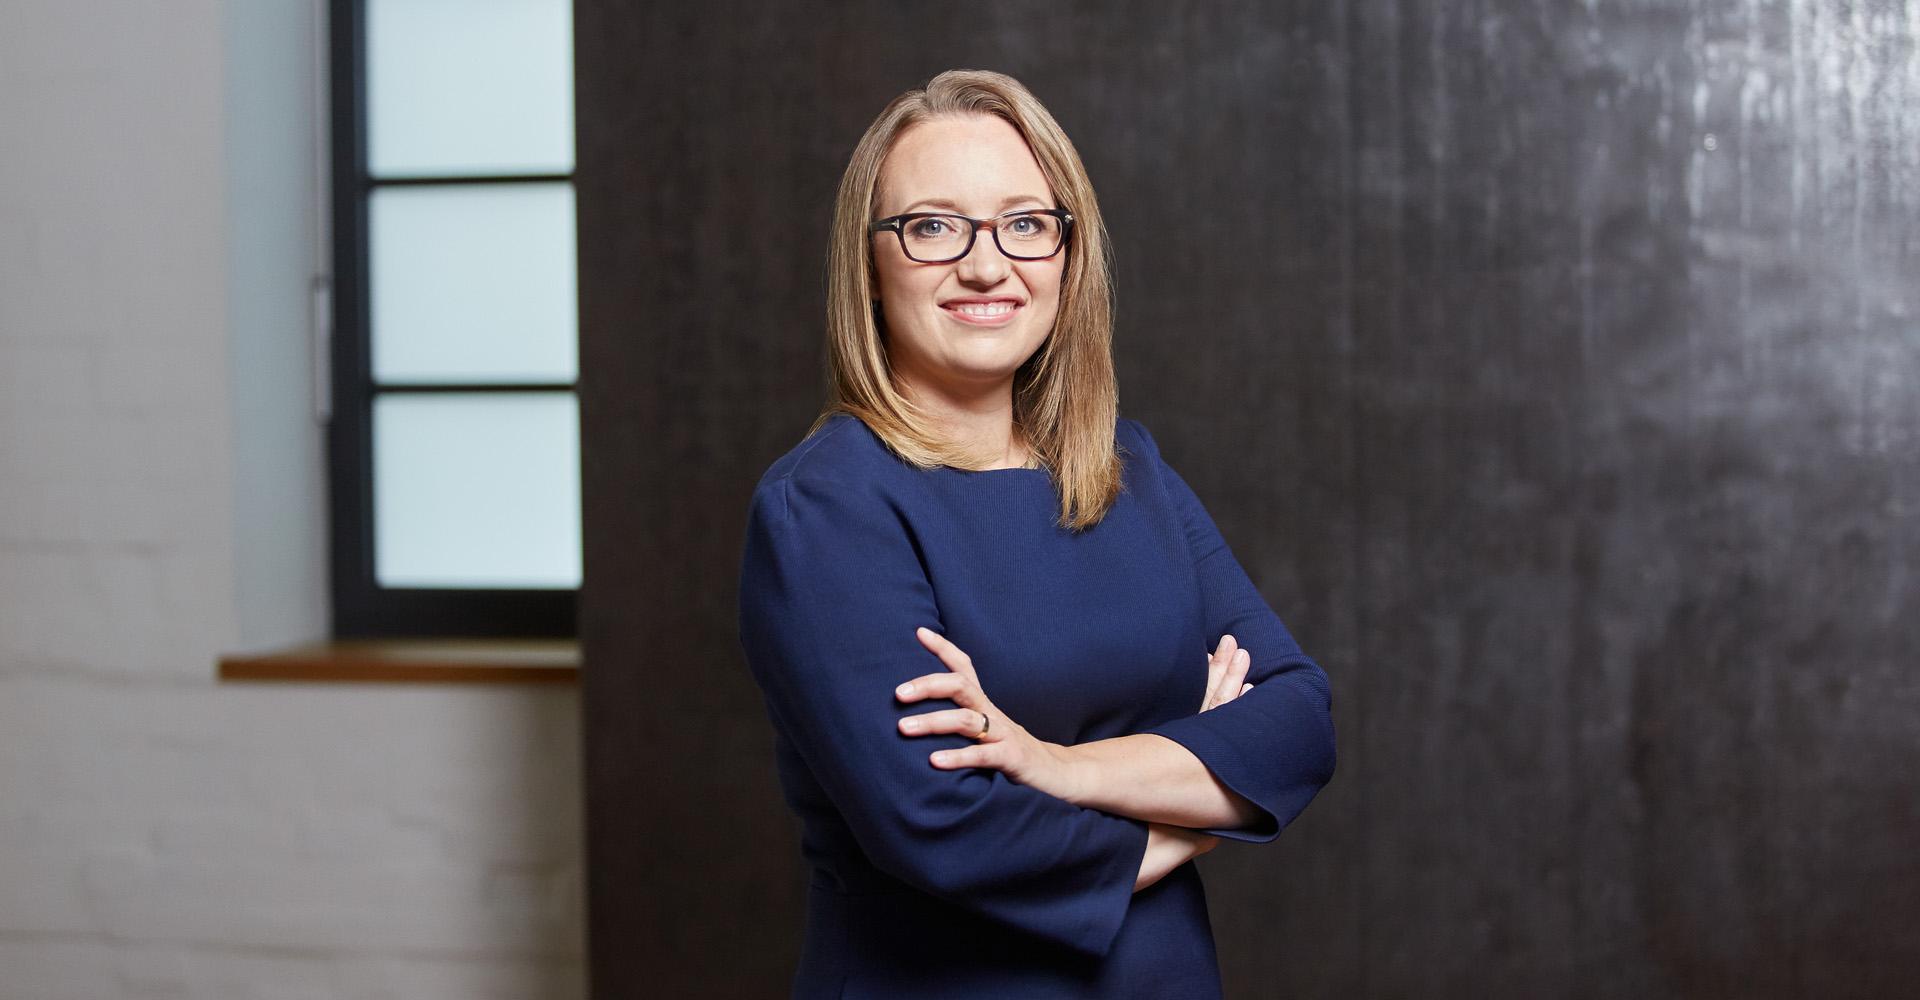 Natascha Hoffner